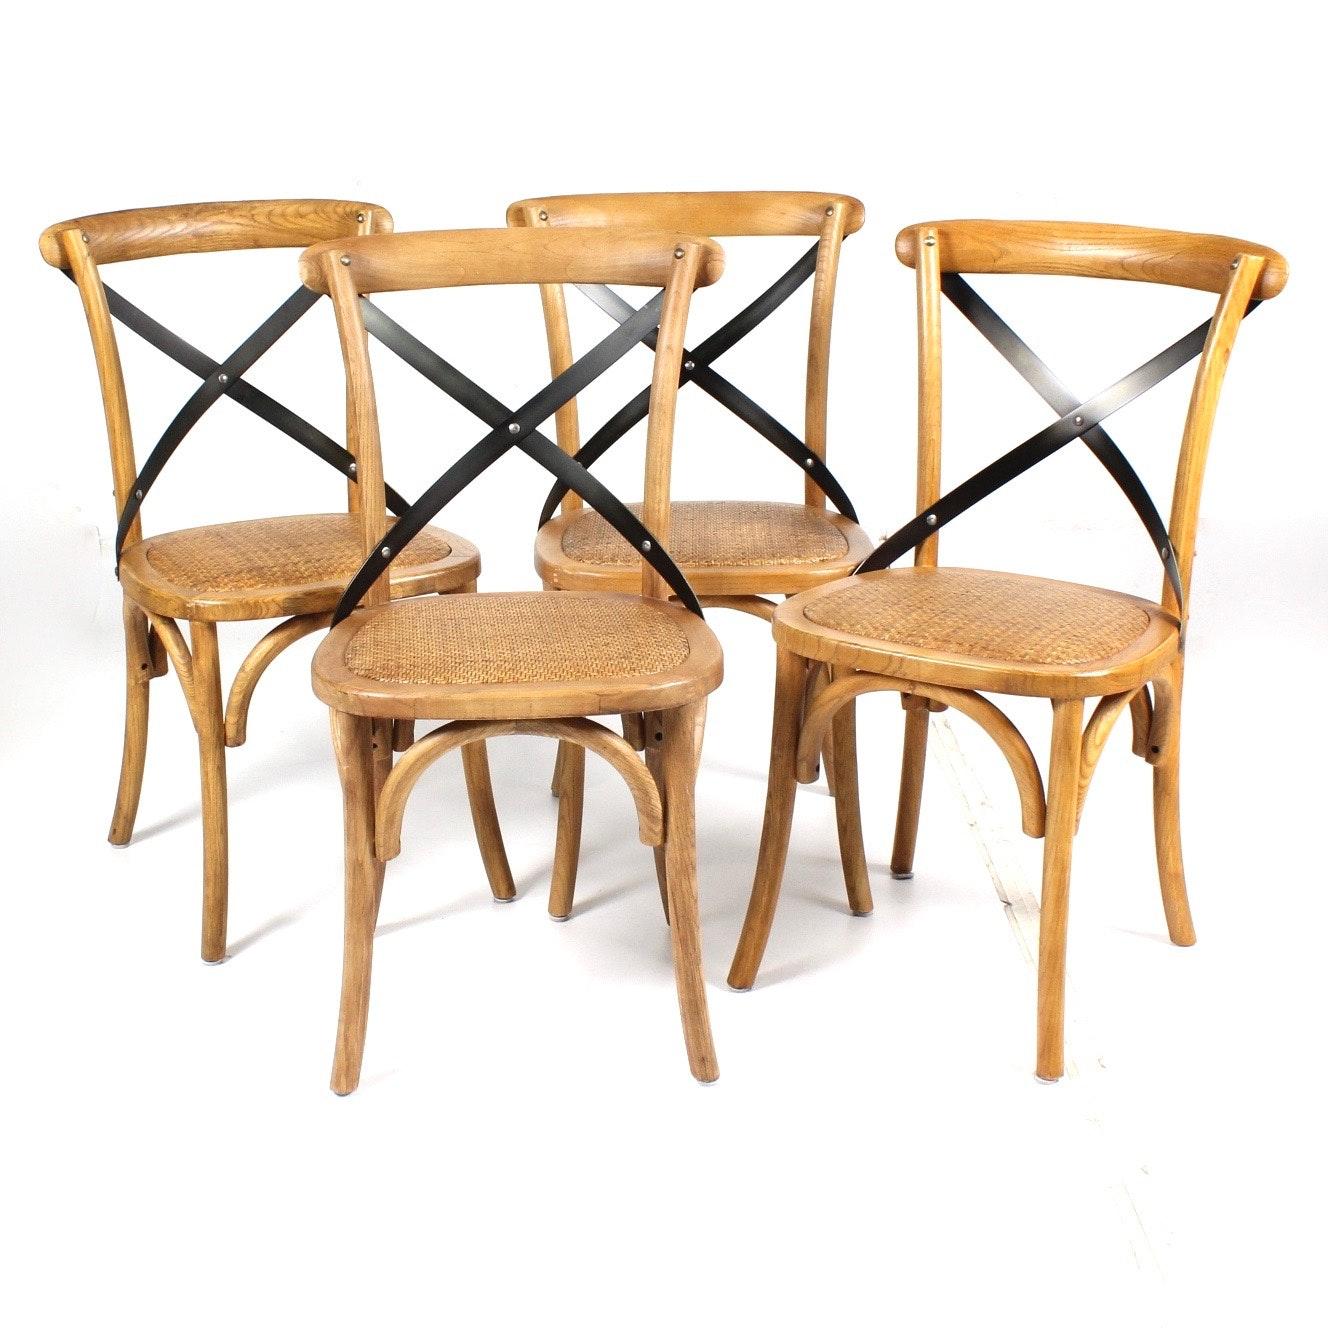 "Arhaus ""Cadence"" Dining Chairs"